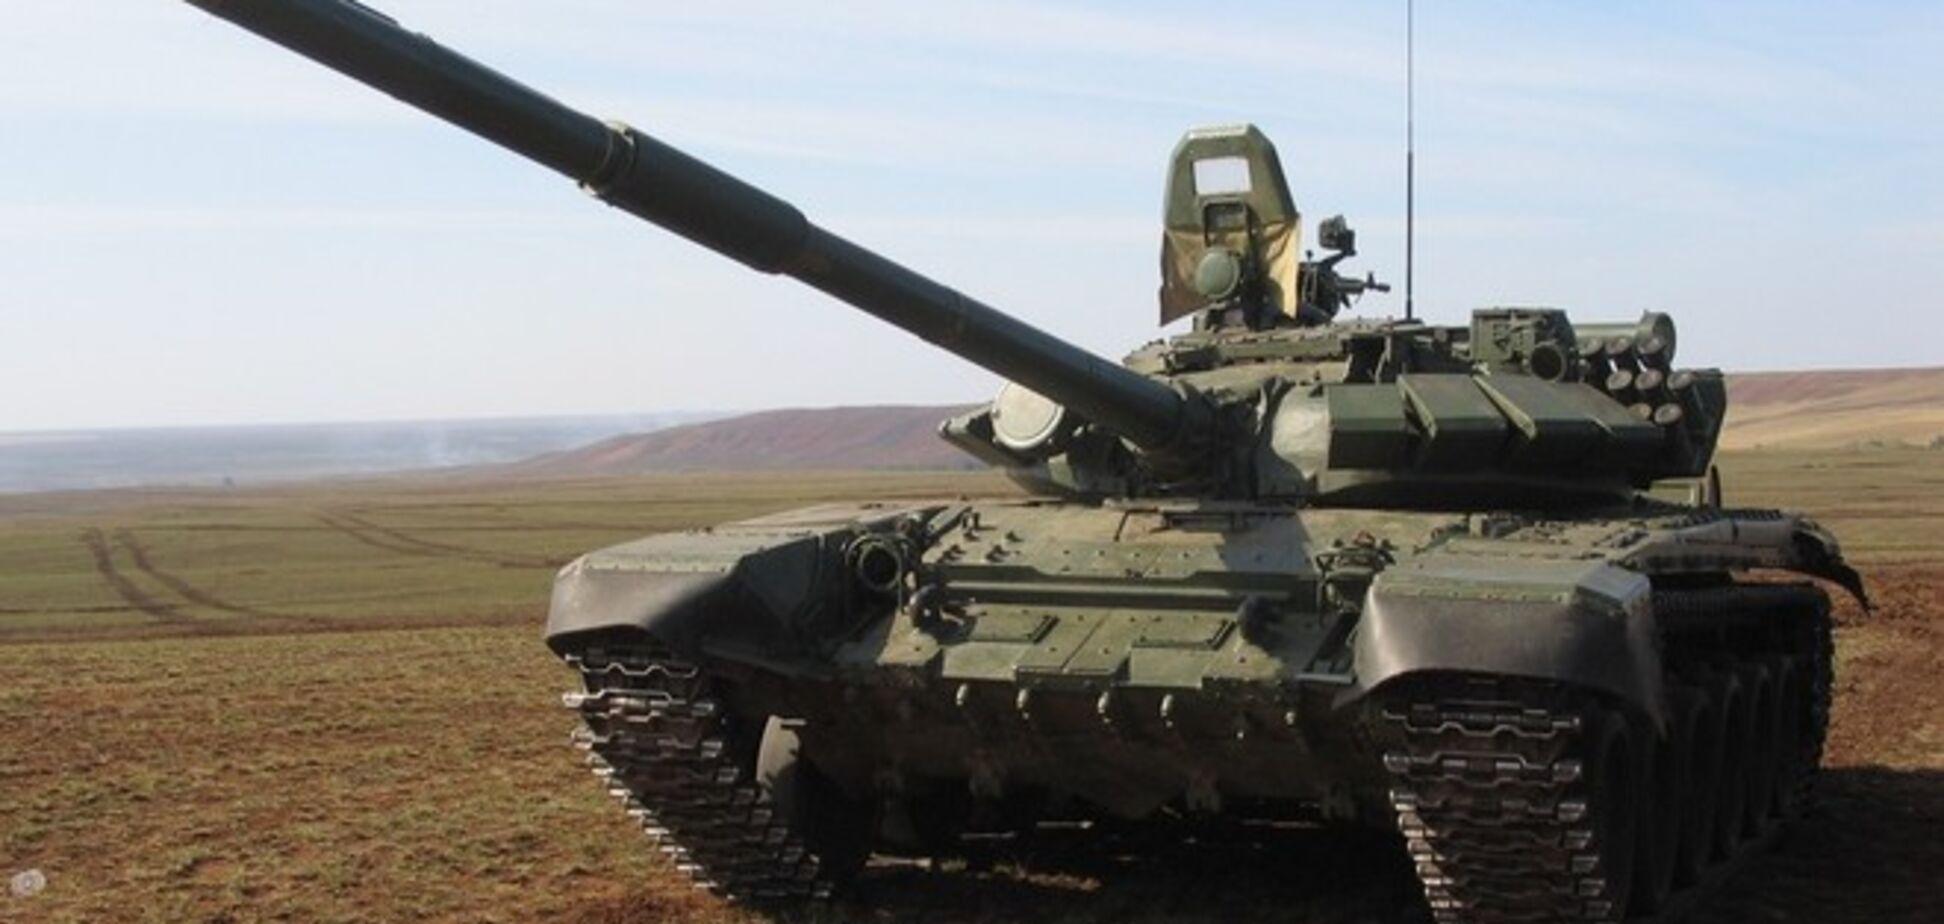 С территории России на Донбасс заехали три конвоя снабжения и танки Т-72 - Тымчук